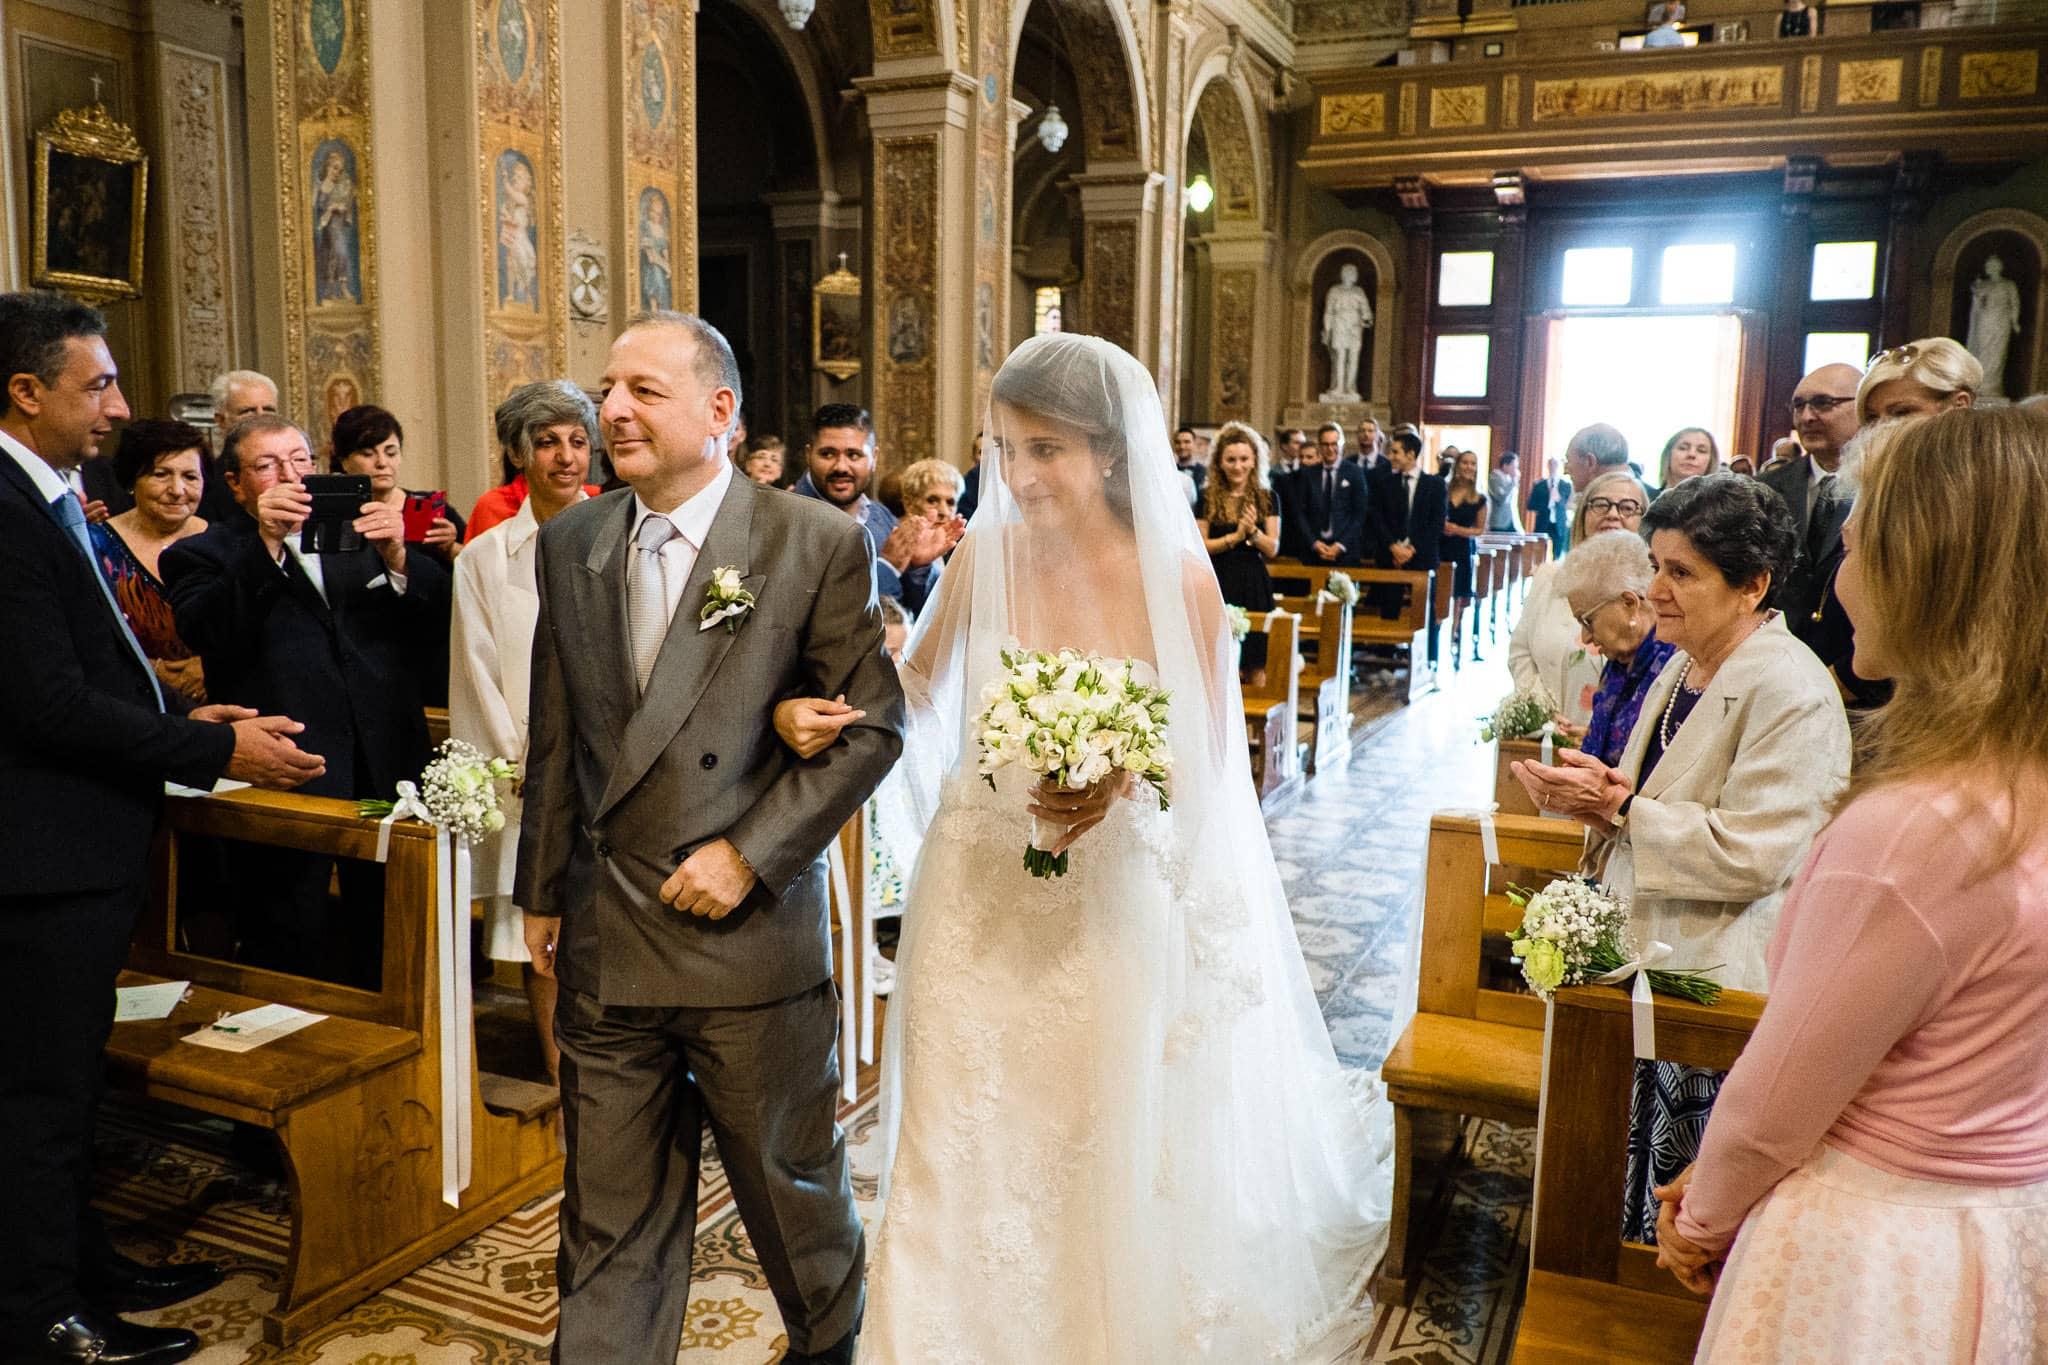 fotografo matrimonio cascina diodona varese lucarossifoto 00010